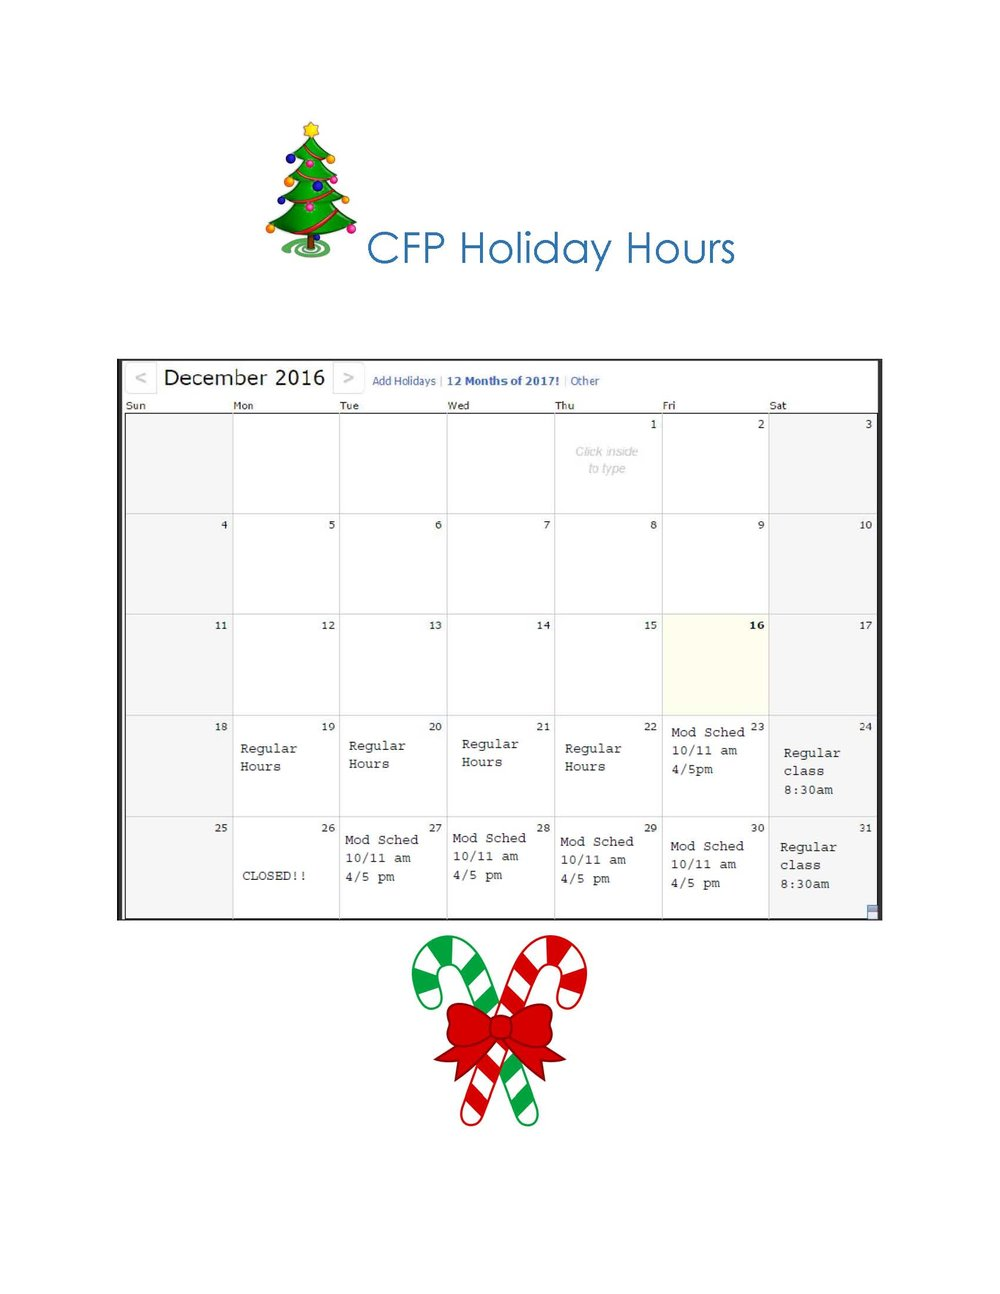 CFP Holiday Hours 2016.jpg